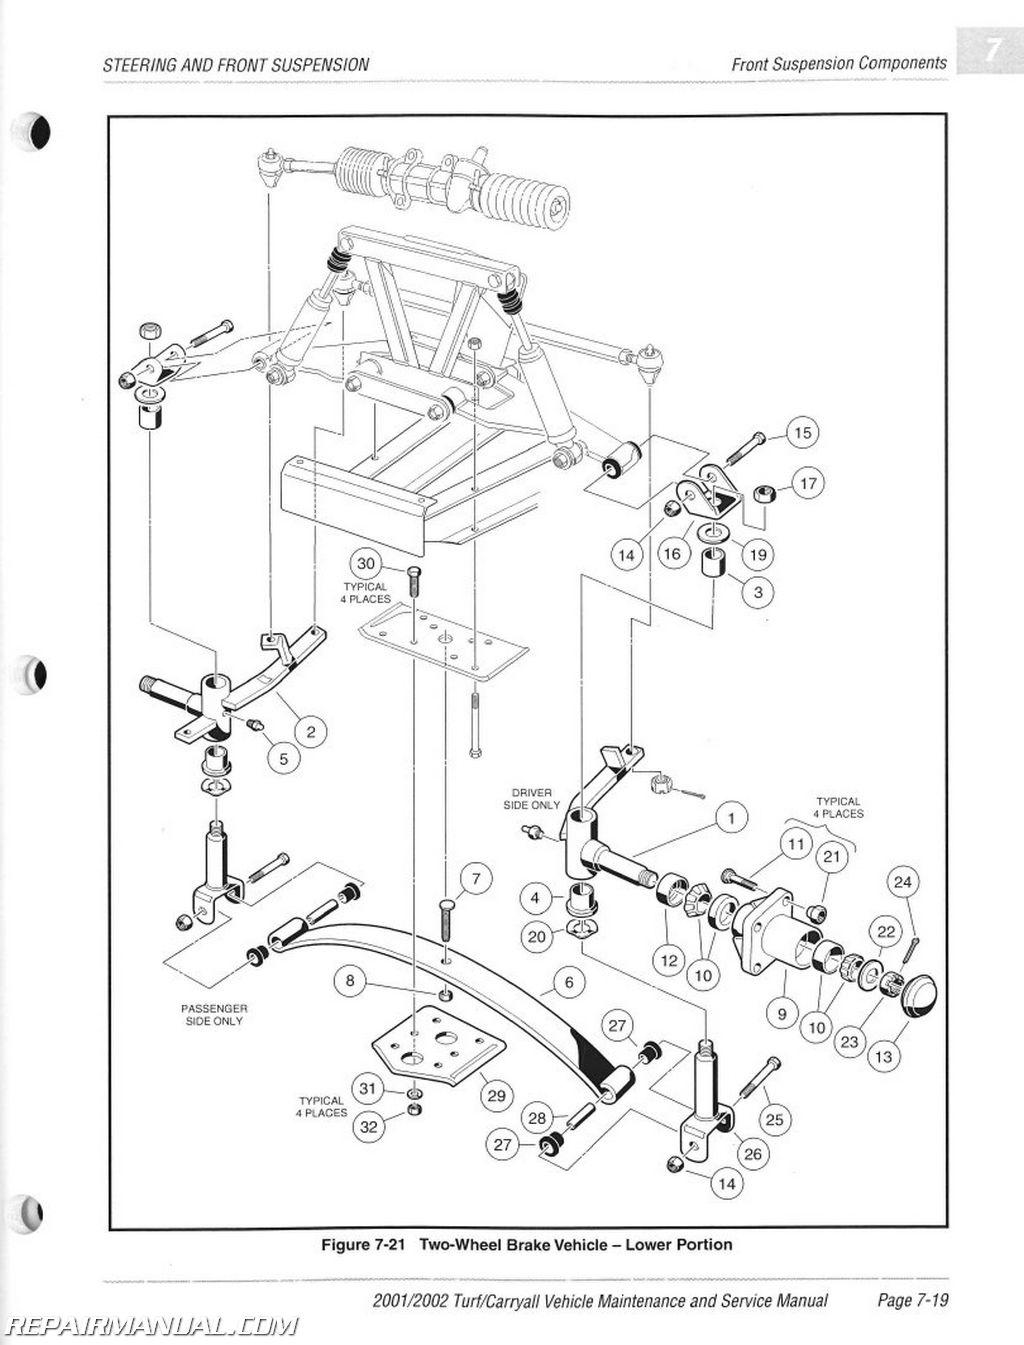 Electrolux Vacuum Parts Diagram Besides Cushman Golf Cart Wiring